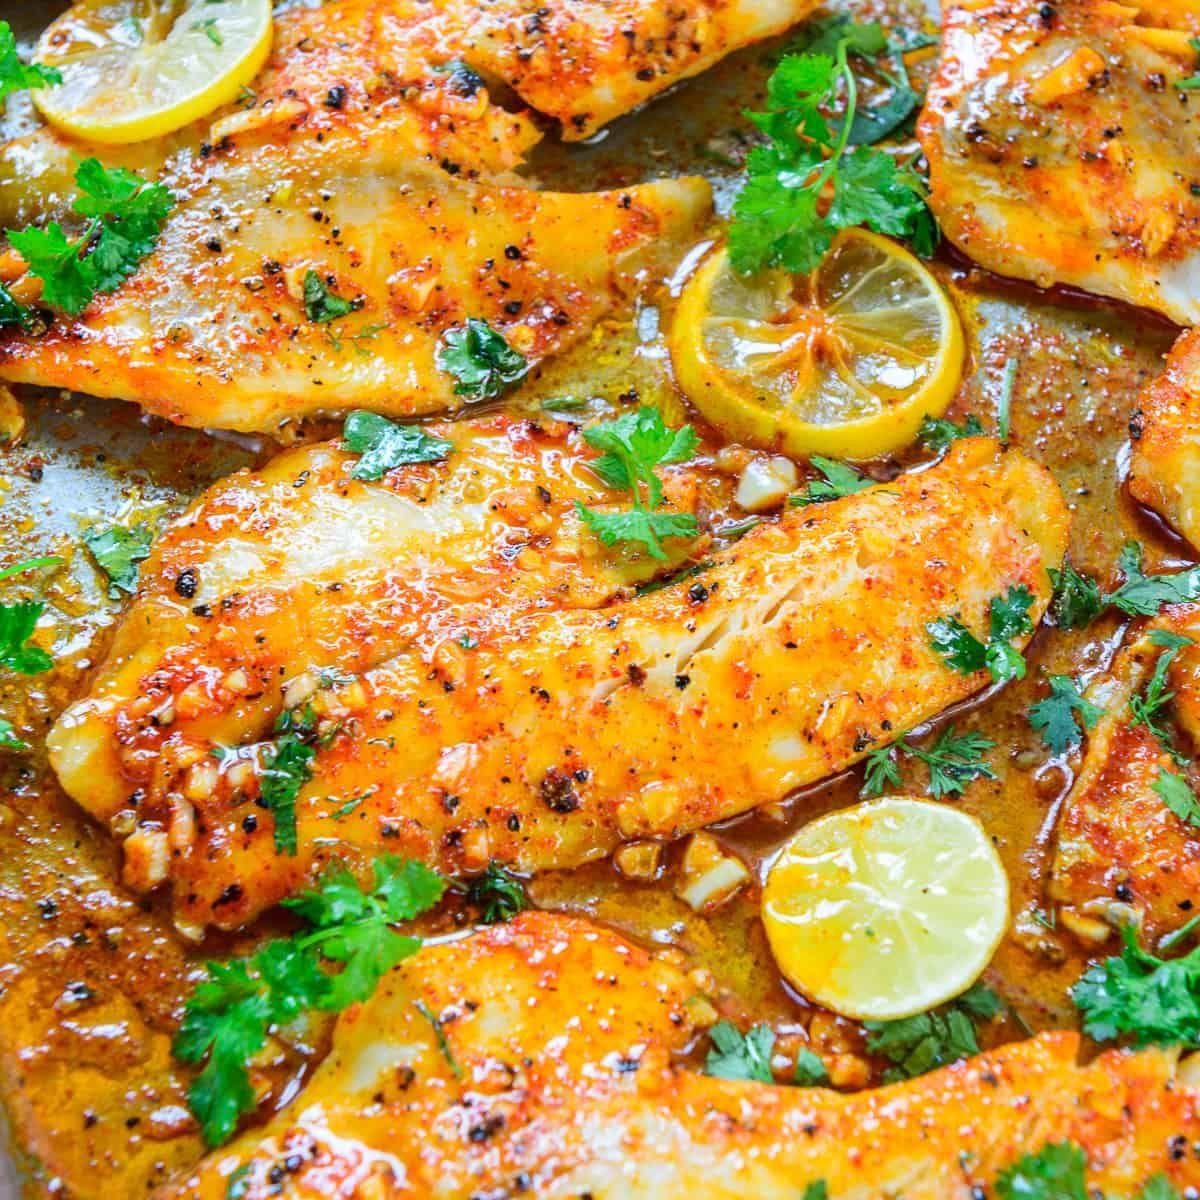 Baked Tilapia Fish In 2020 Baked Tilapia Recipes Baked Tilapia Fillets Tilapia Recipes